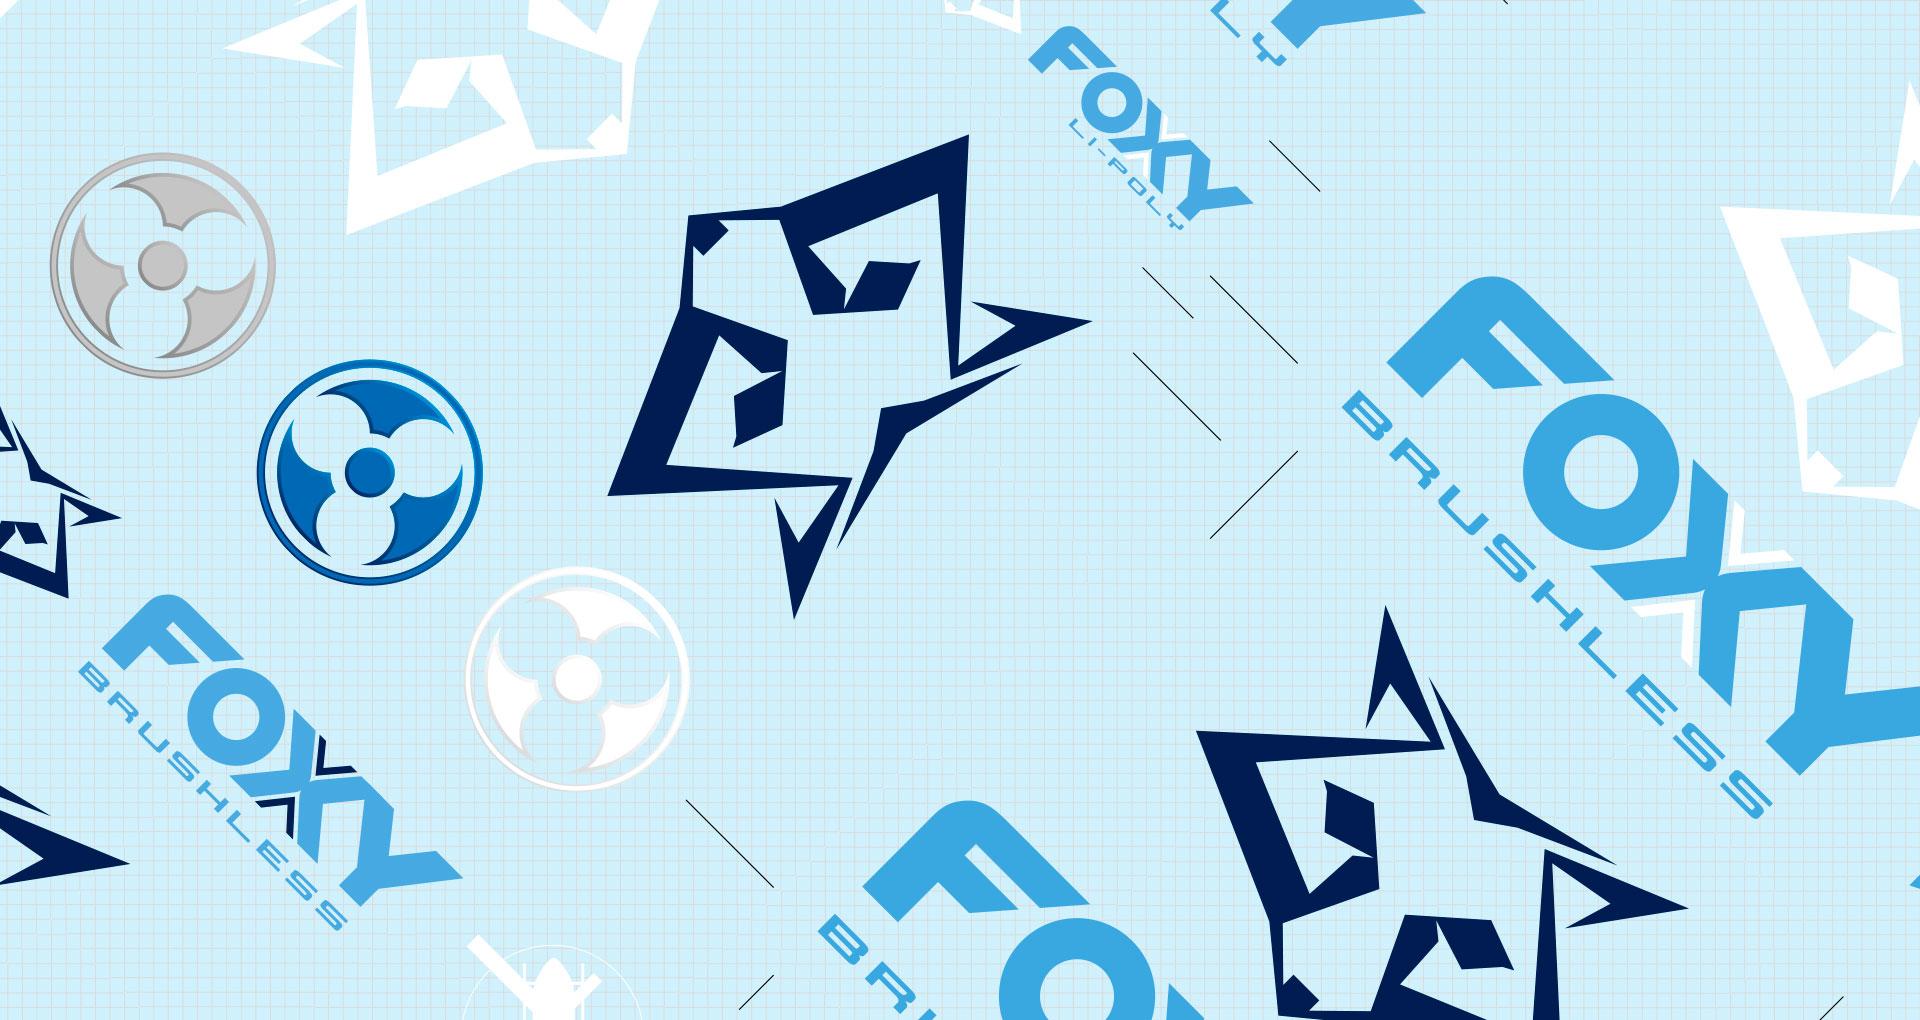 FOXY-A_04